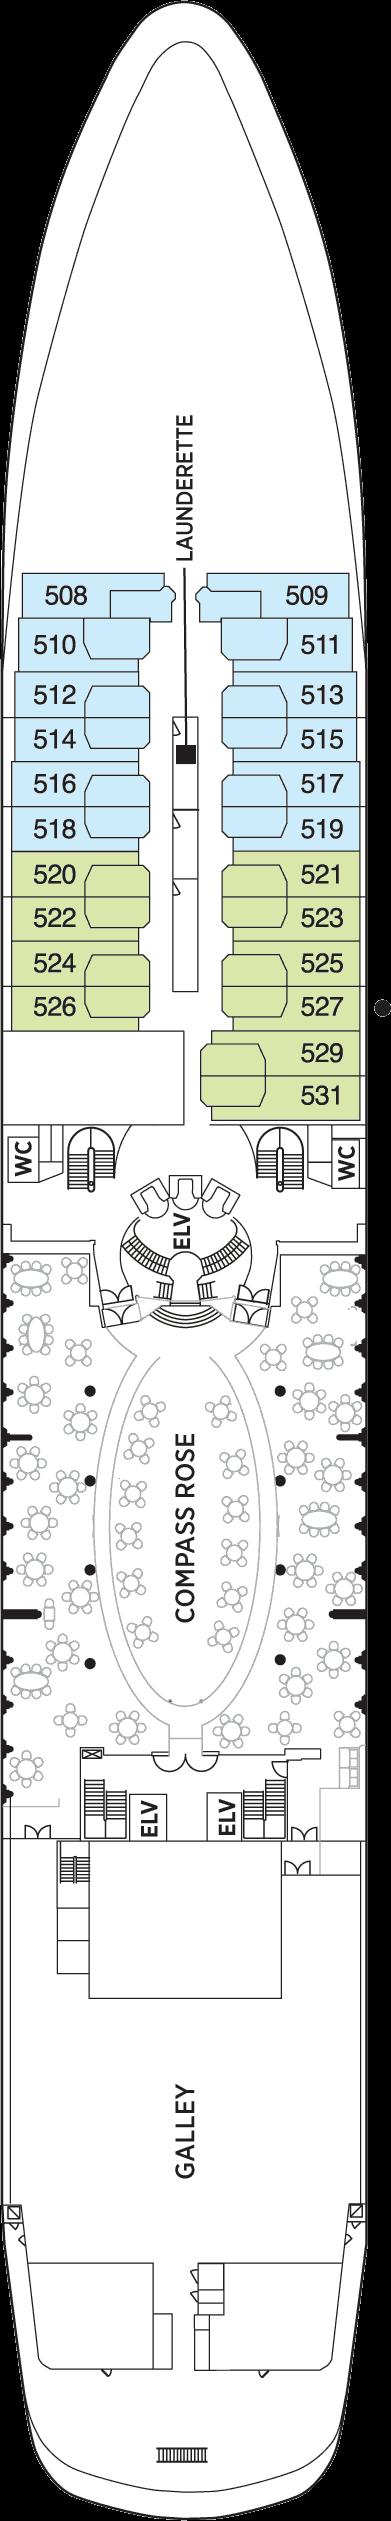 Seven Seas Navigator - Deck 5